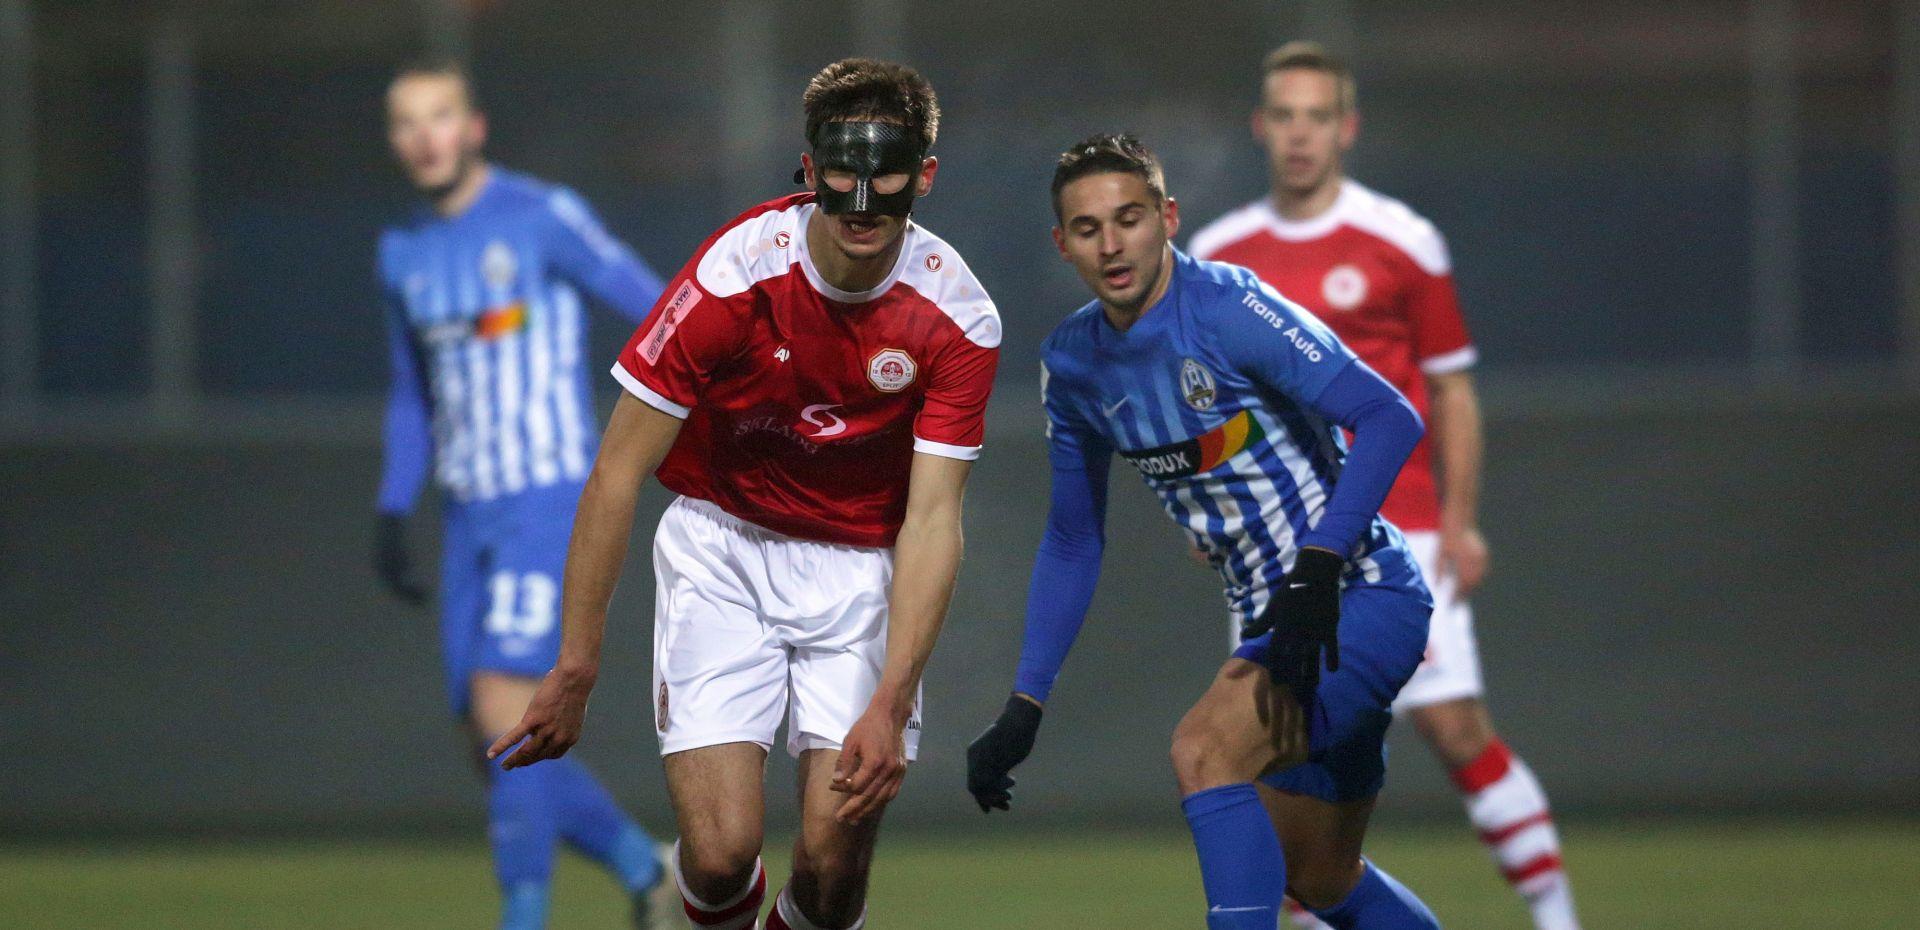 HNK Lokomotiva slavila protiv Splita